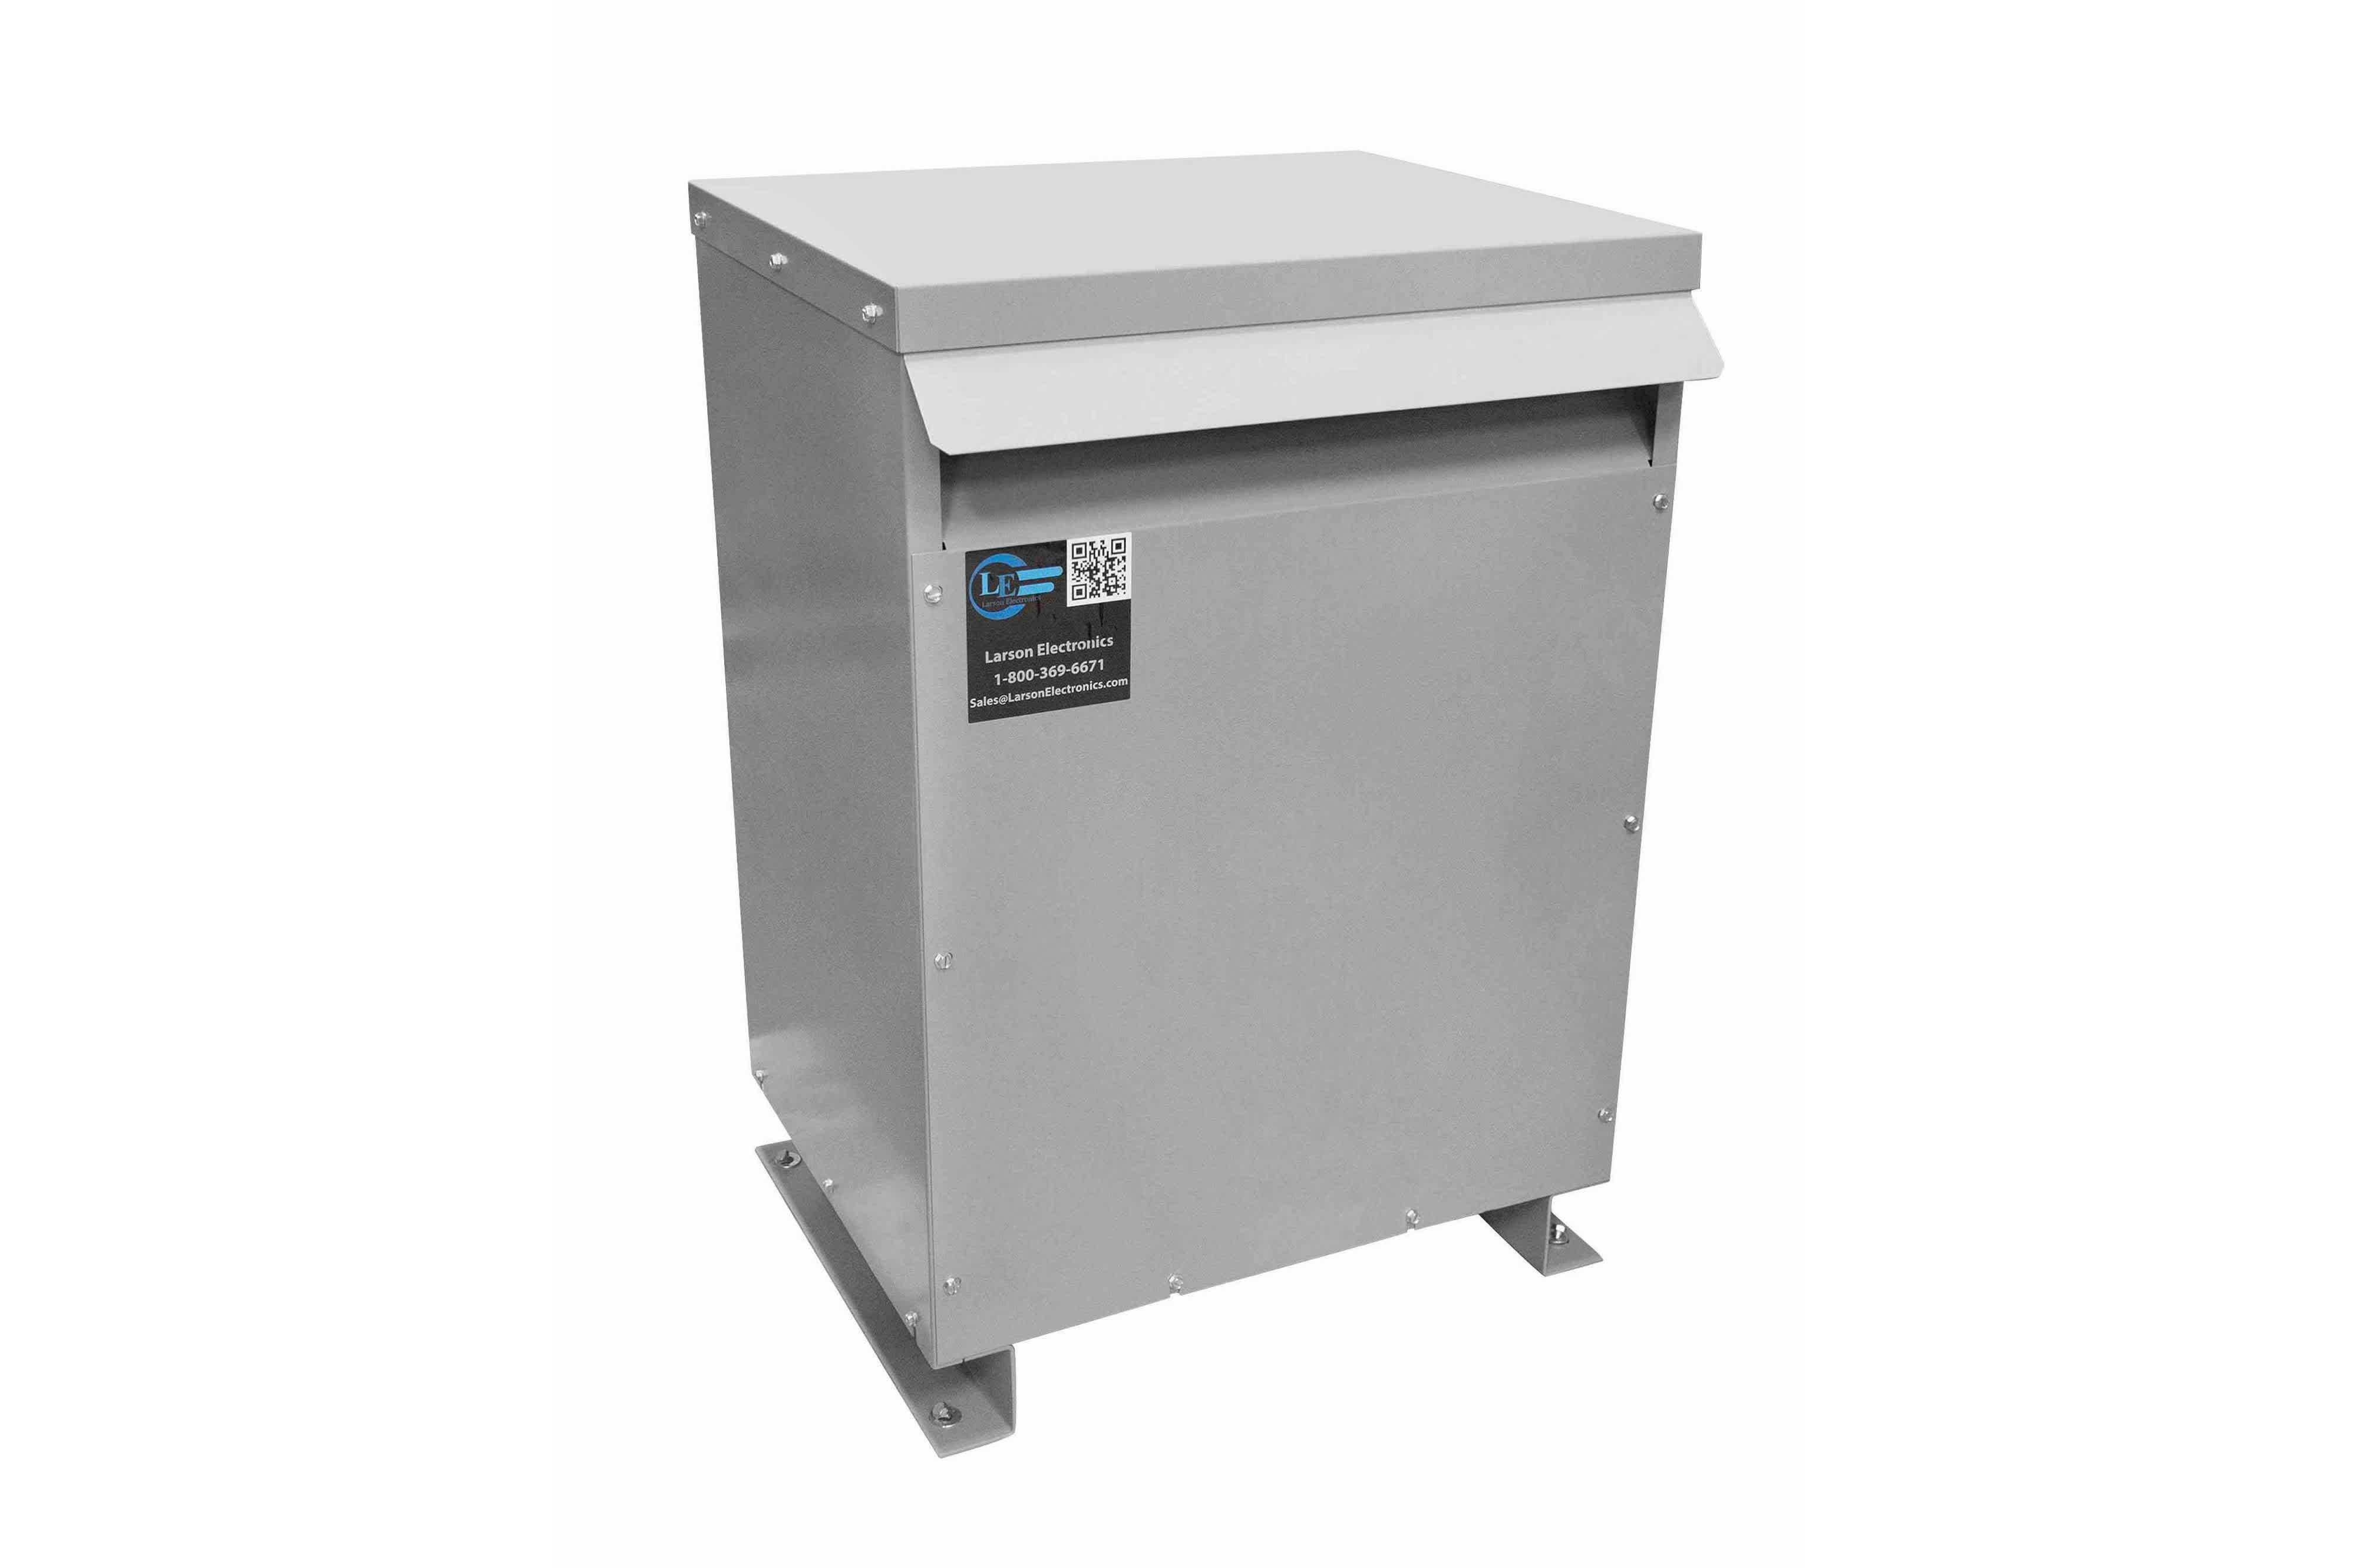 115 kVA 3PH Isolation Transformer, 208V Wye Primary, 208V Delta Secondary, N3R, Ventilated, 60 Hz